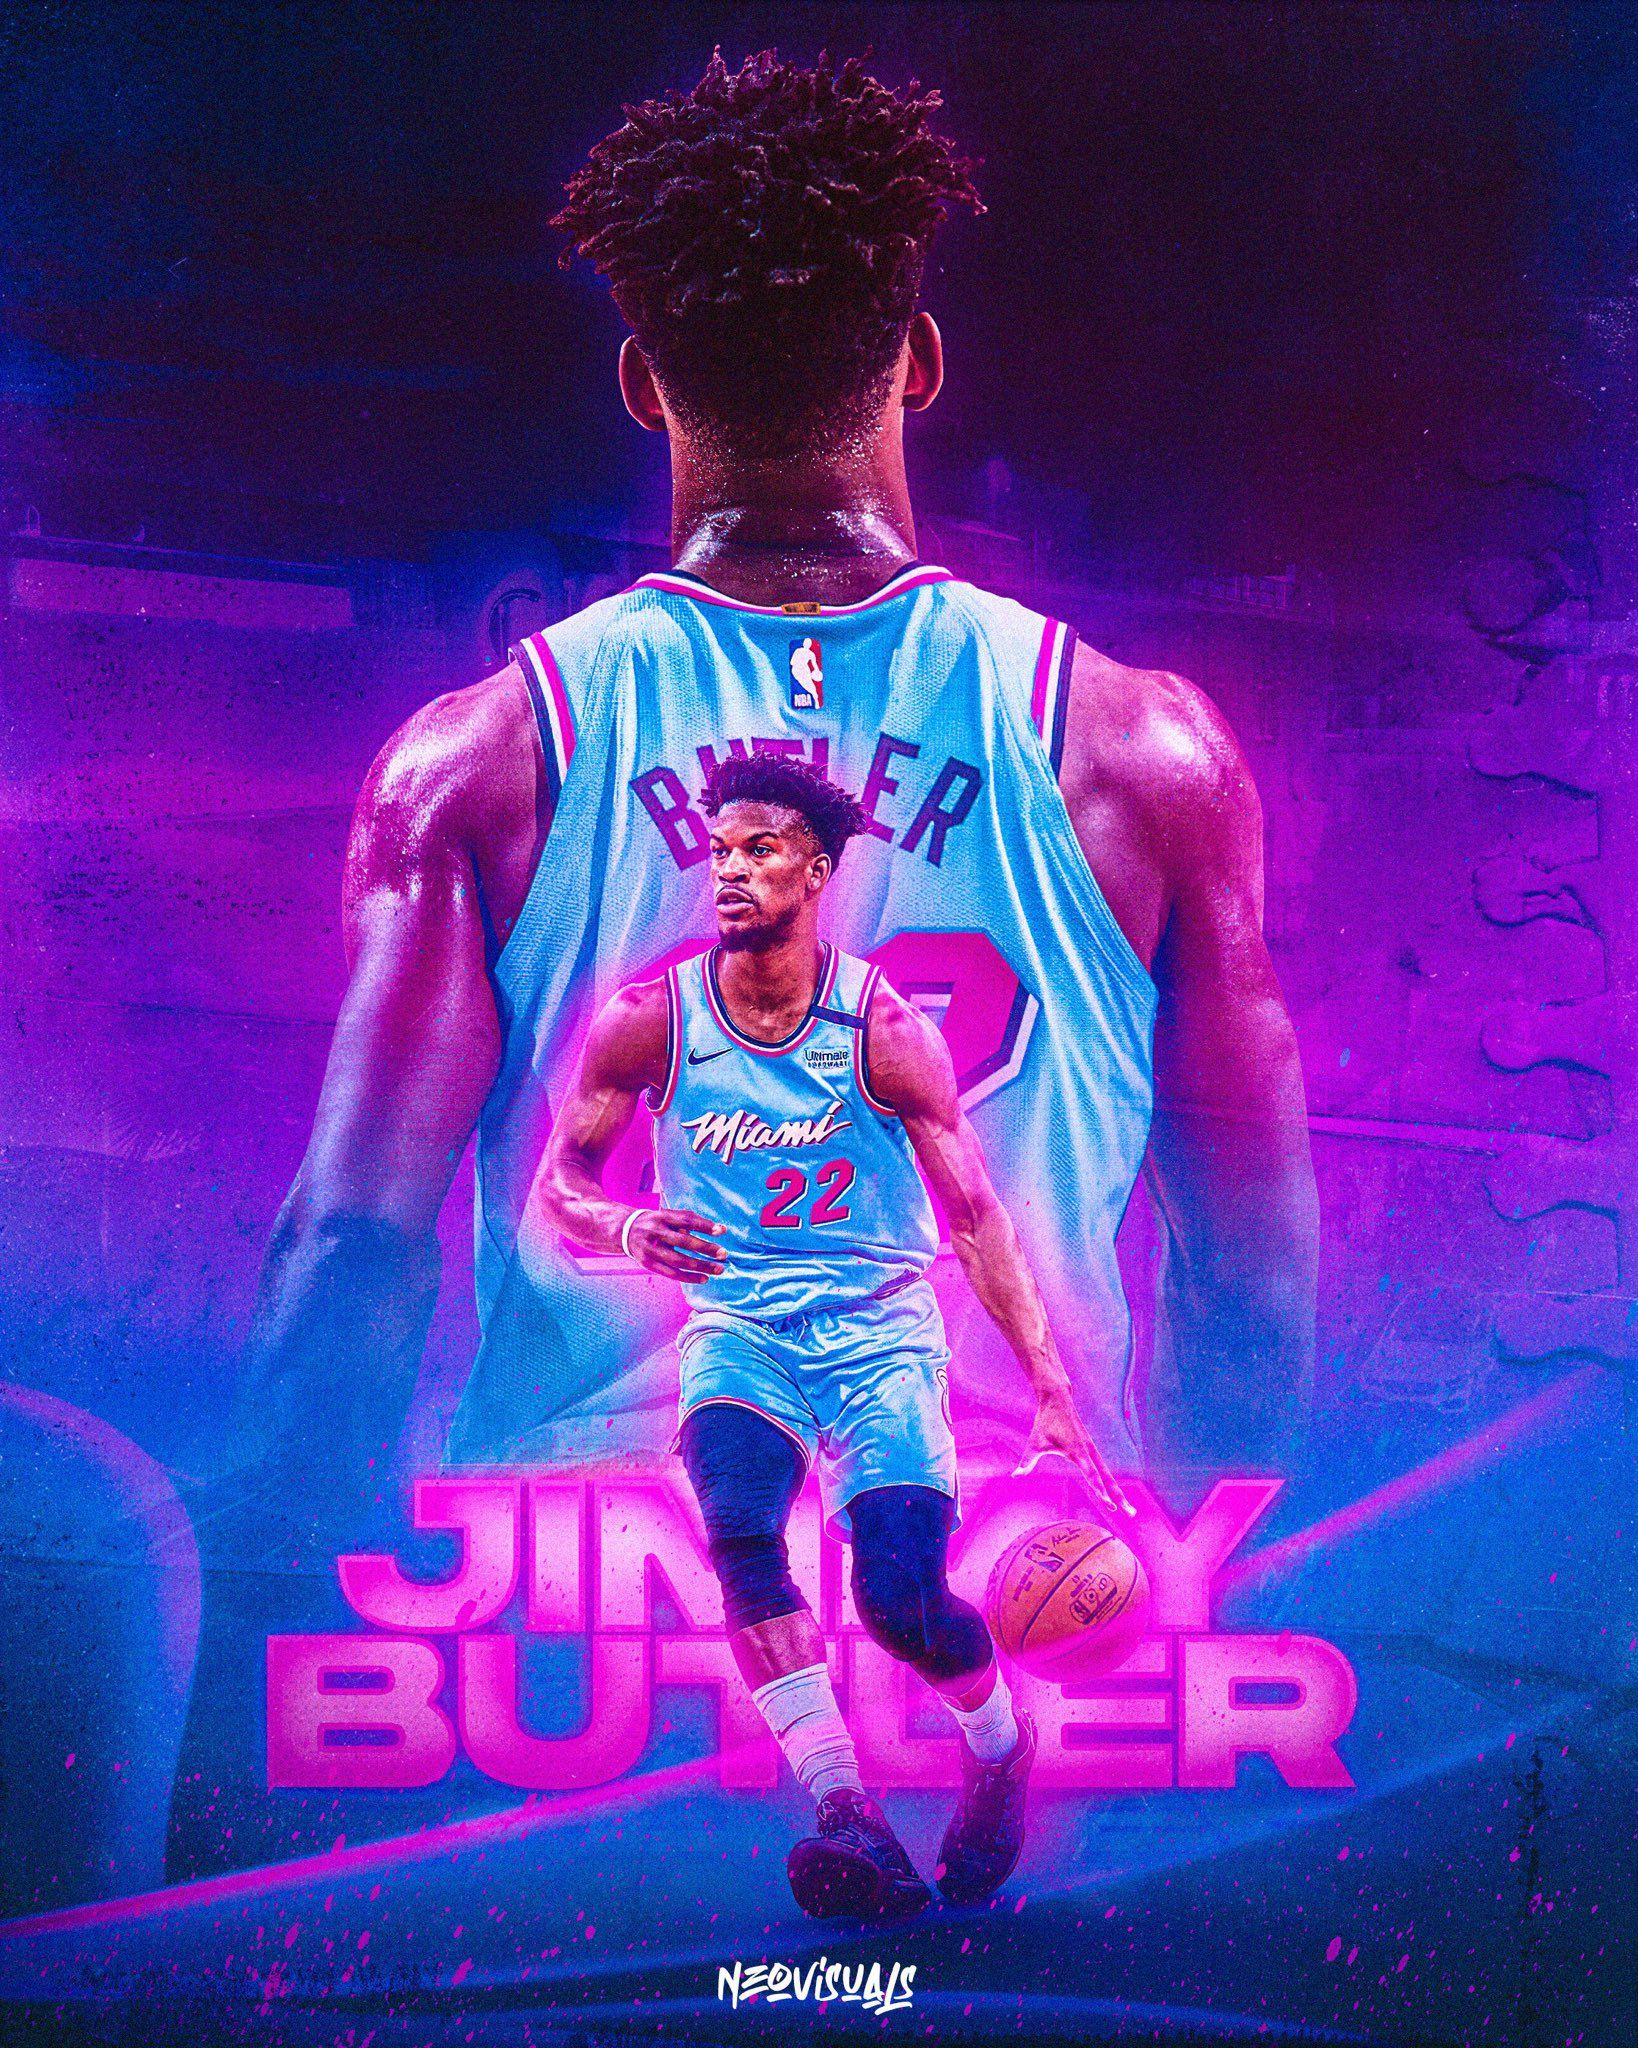 Maya On Twitter Nba Artwork Nba Basketball Art Basketball Wallpaper